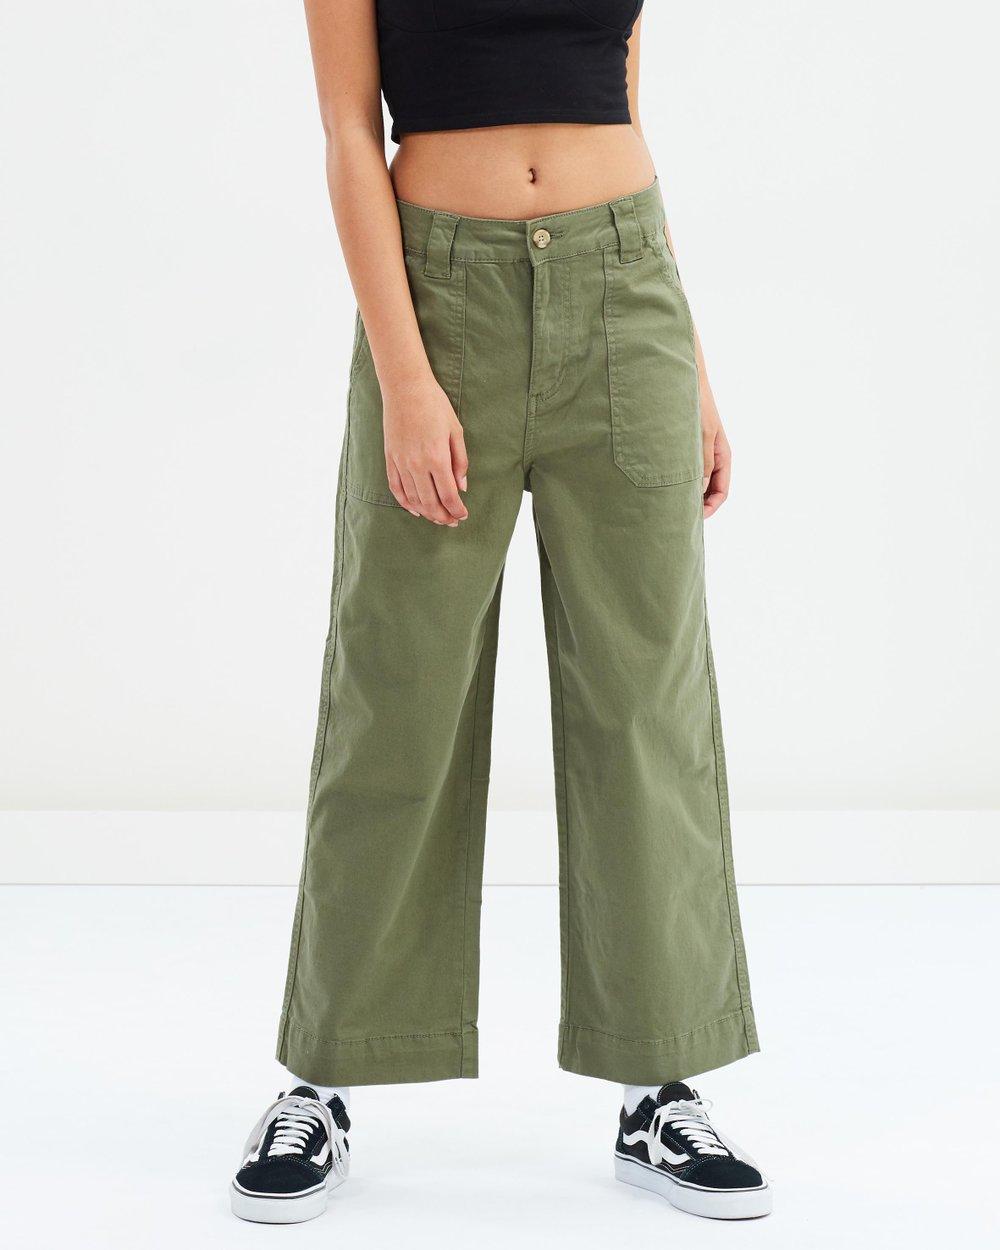 enjoy clearance price prevalent factory authentic Wide Leg Chop Pants